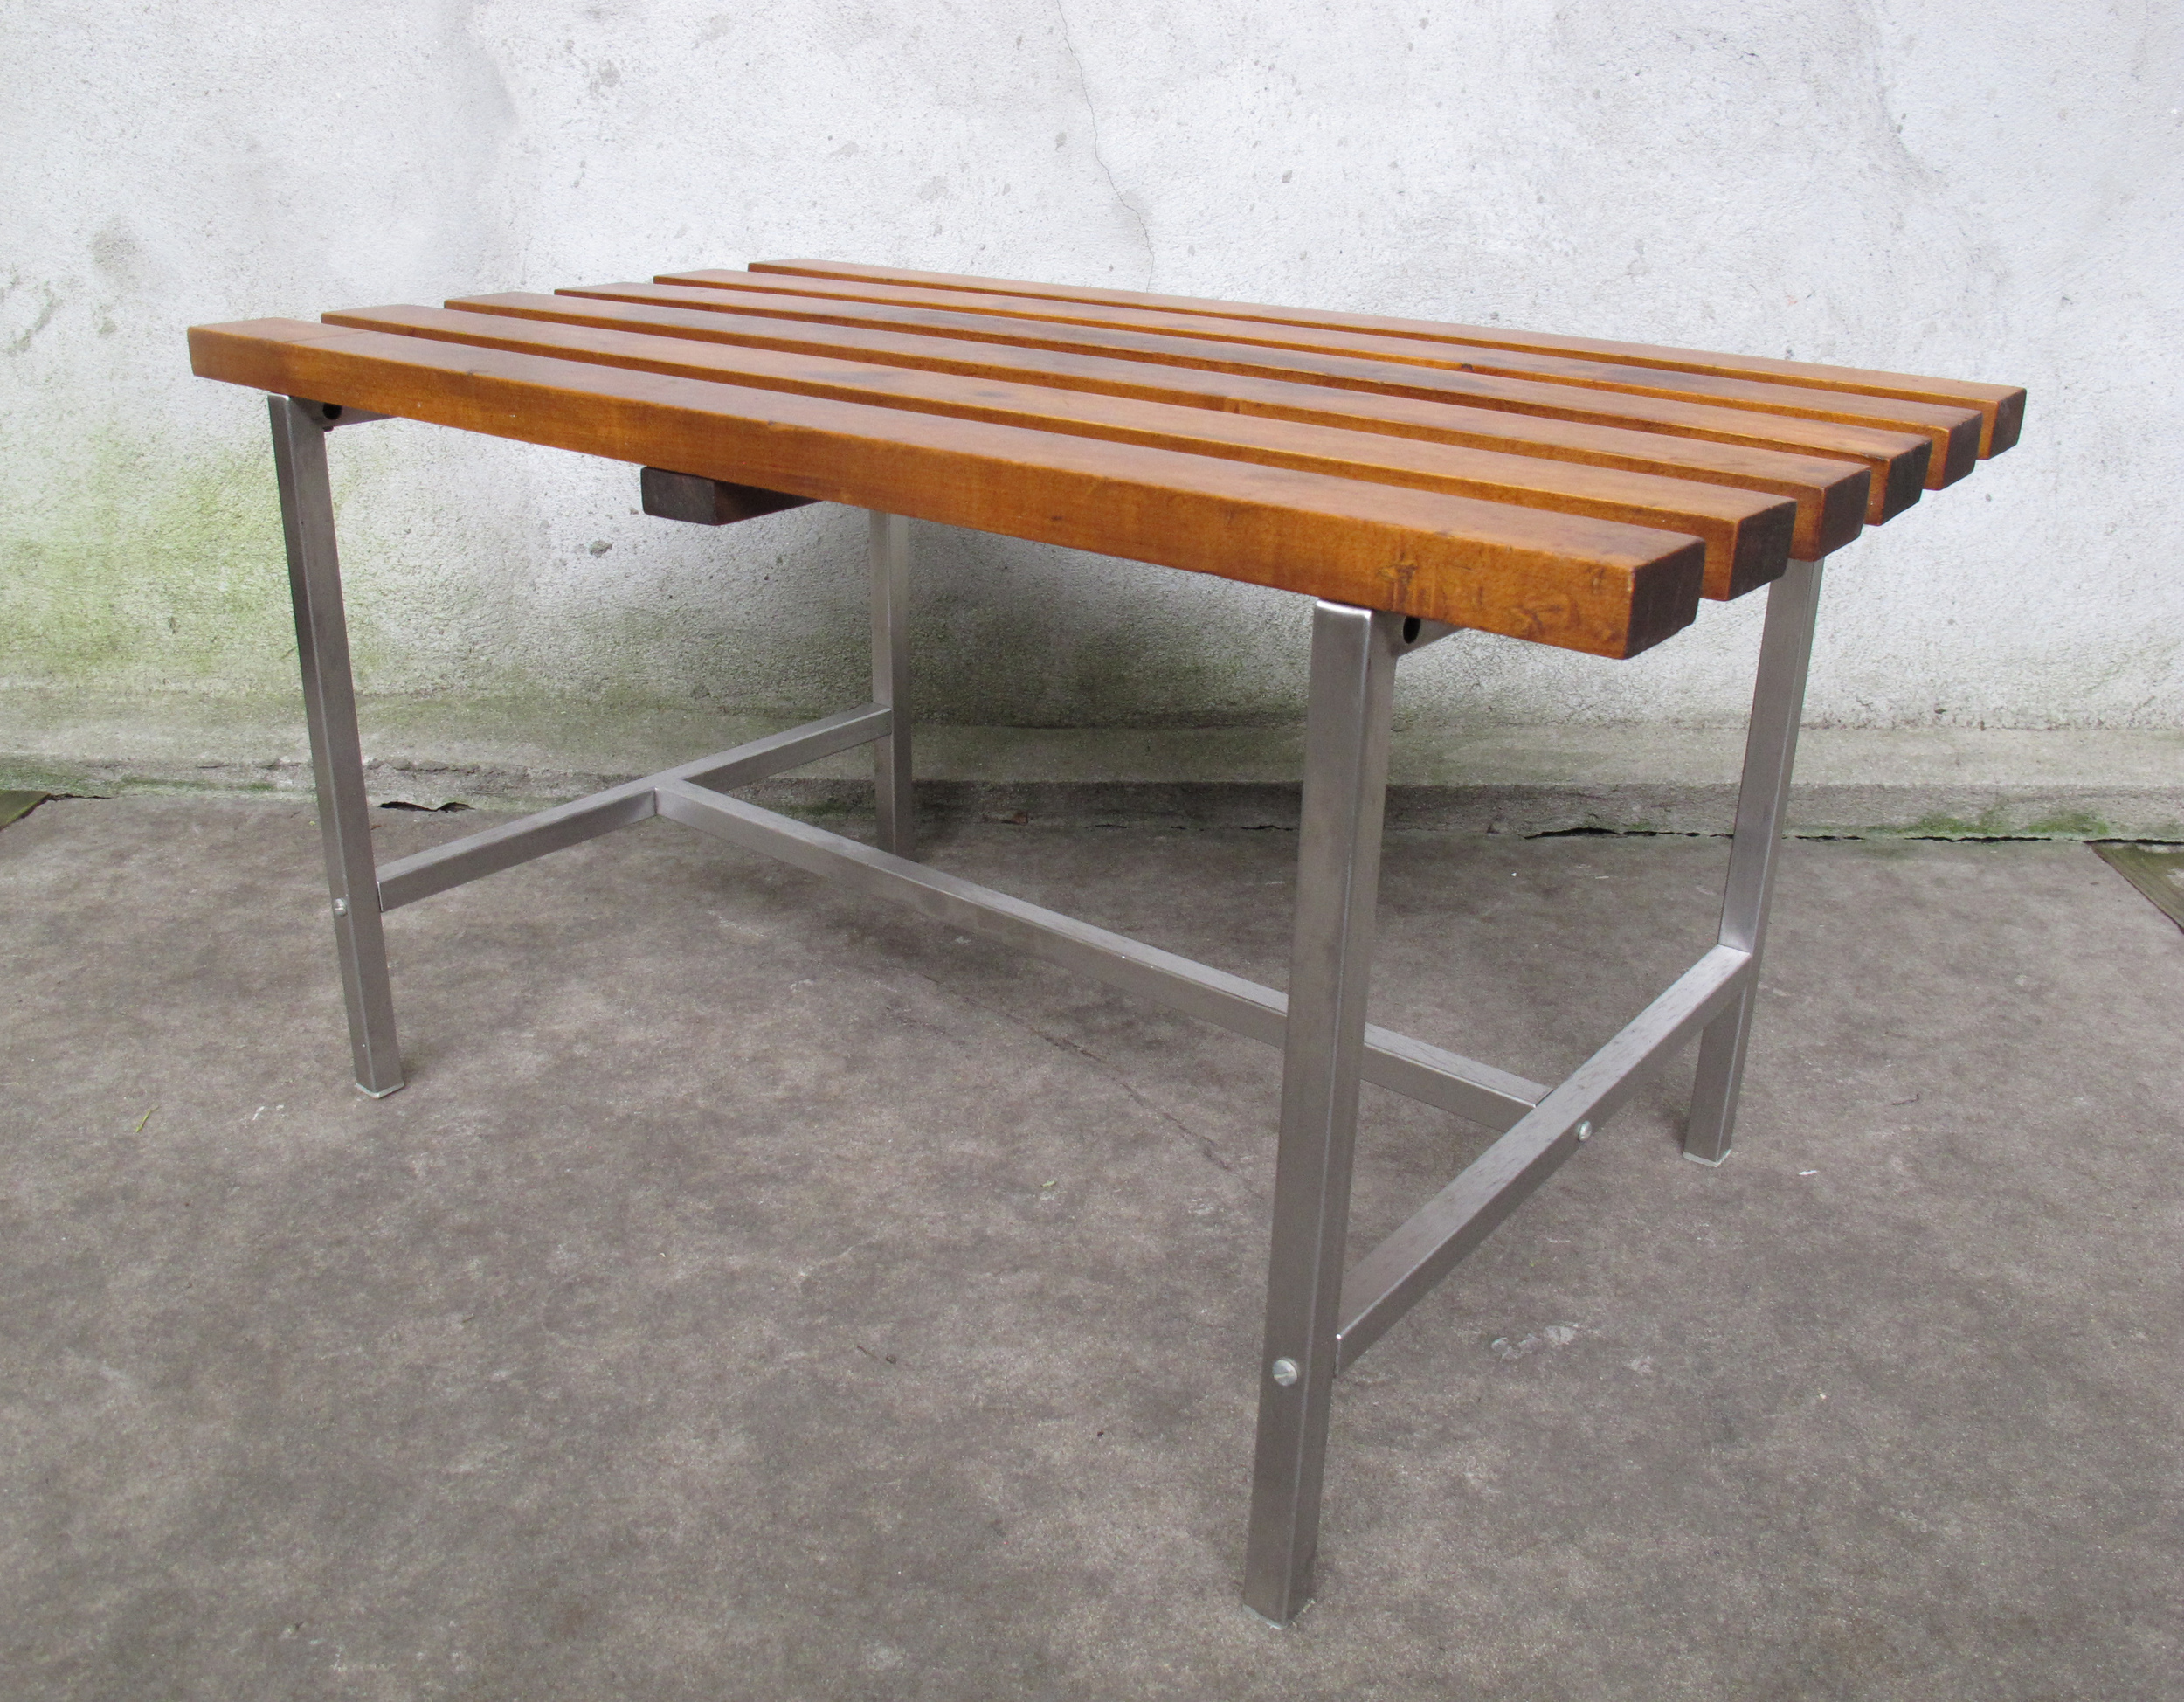 MID CENTURY WOOD & METAL SLAT BENCH COFFEE TABLE